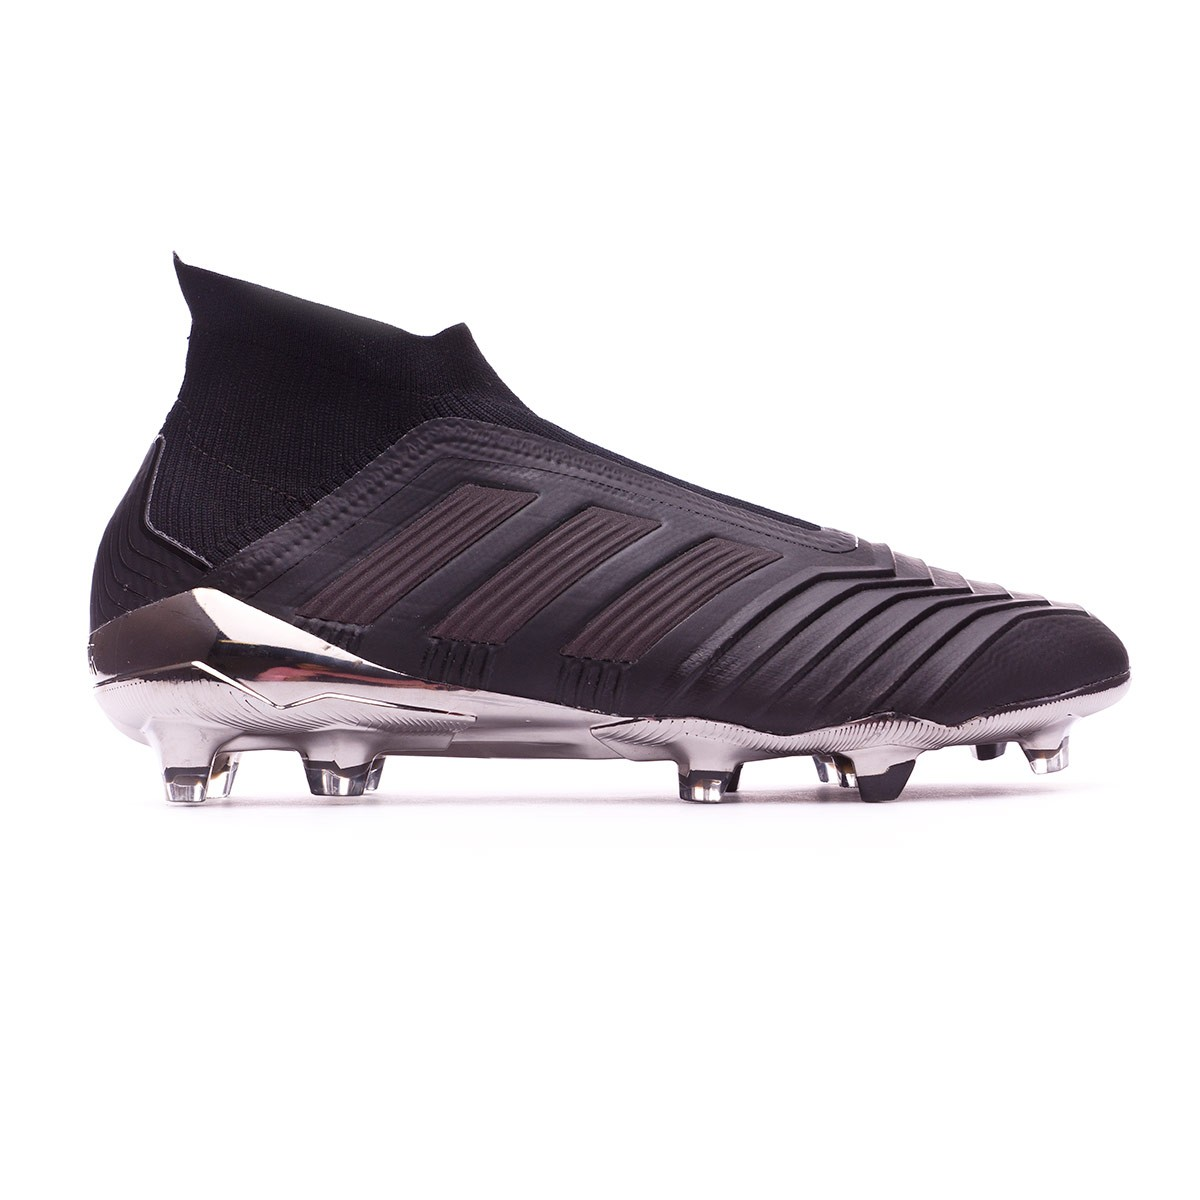 Chaussure de foot adidas Predator 18+ FG